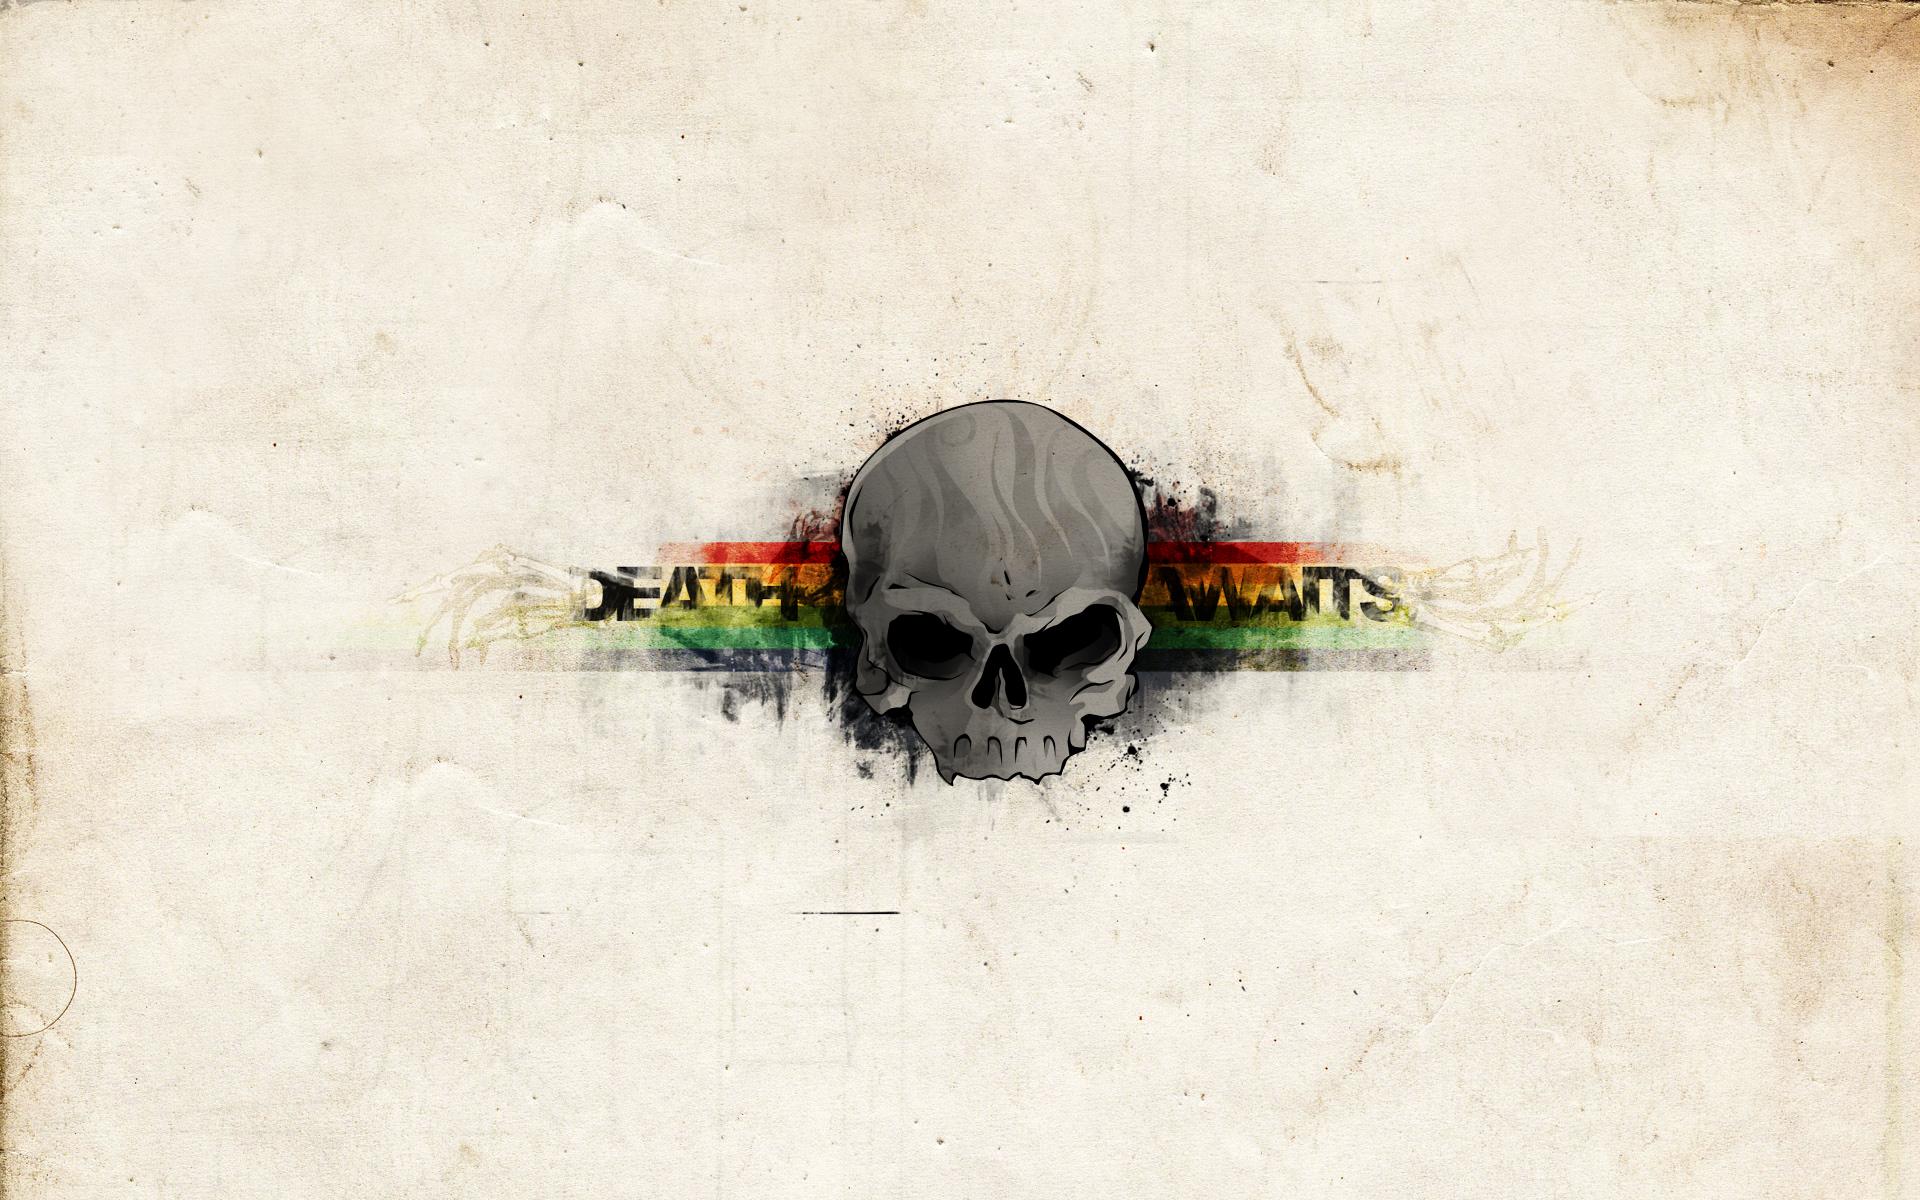 death awaits by O-nay